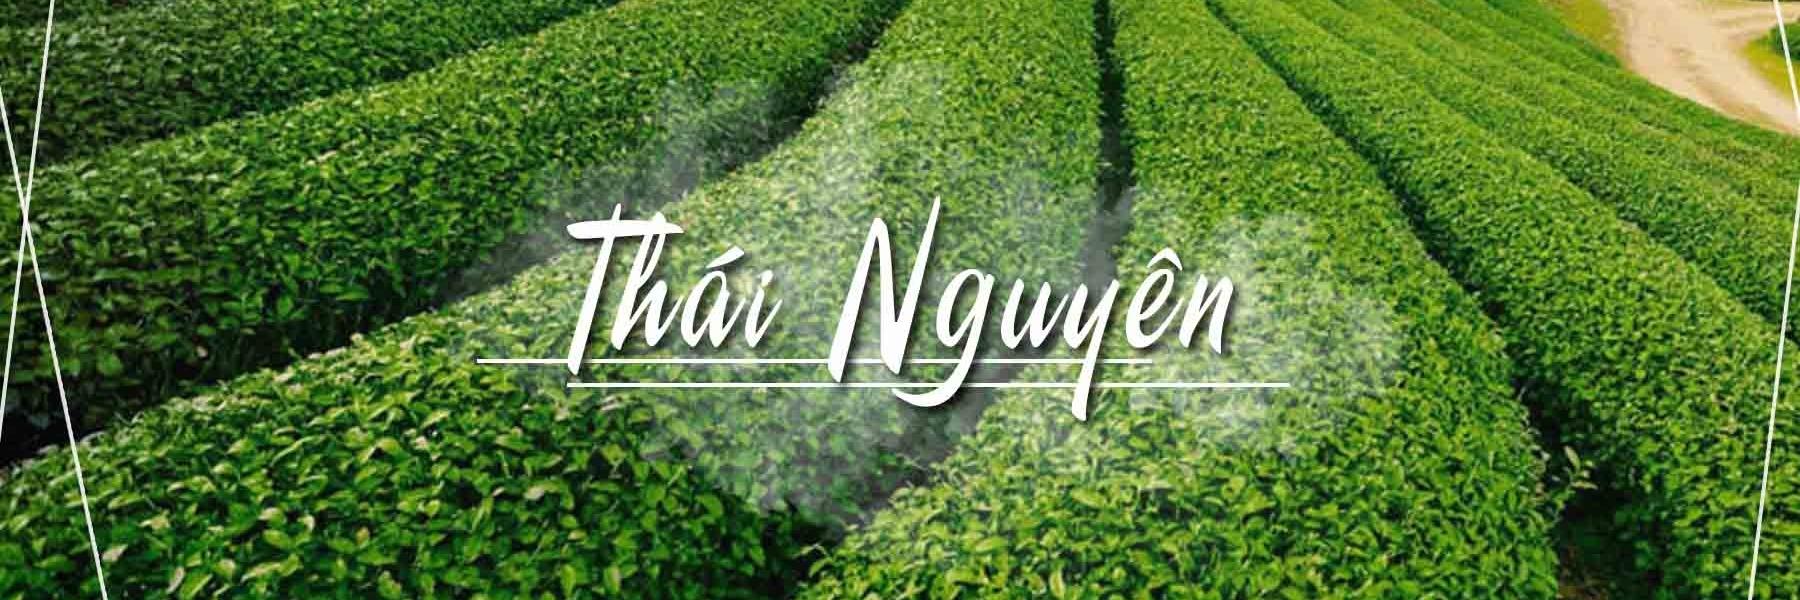 https://gody.vn/blog/lifeandgostudio4271/post/nam-gon-trong-long-ban-tay-nhung-thang-canh-dep-nhat-o-thai-nguyen-4742